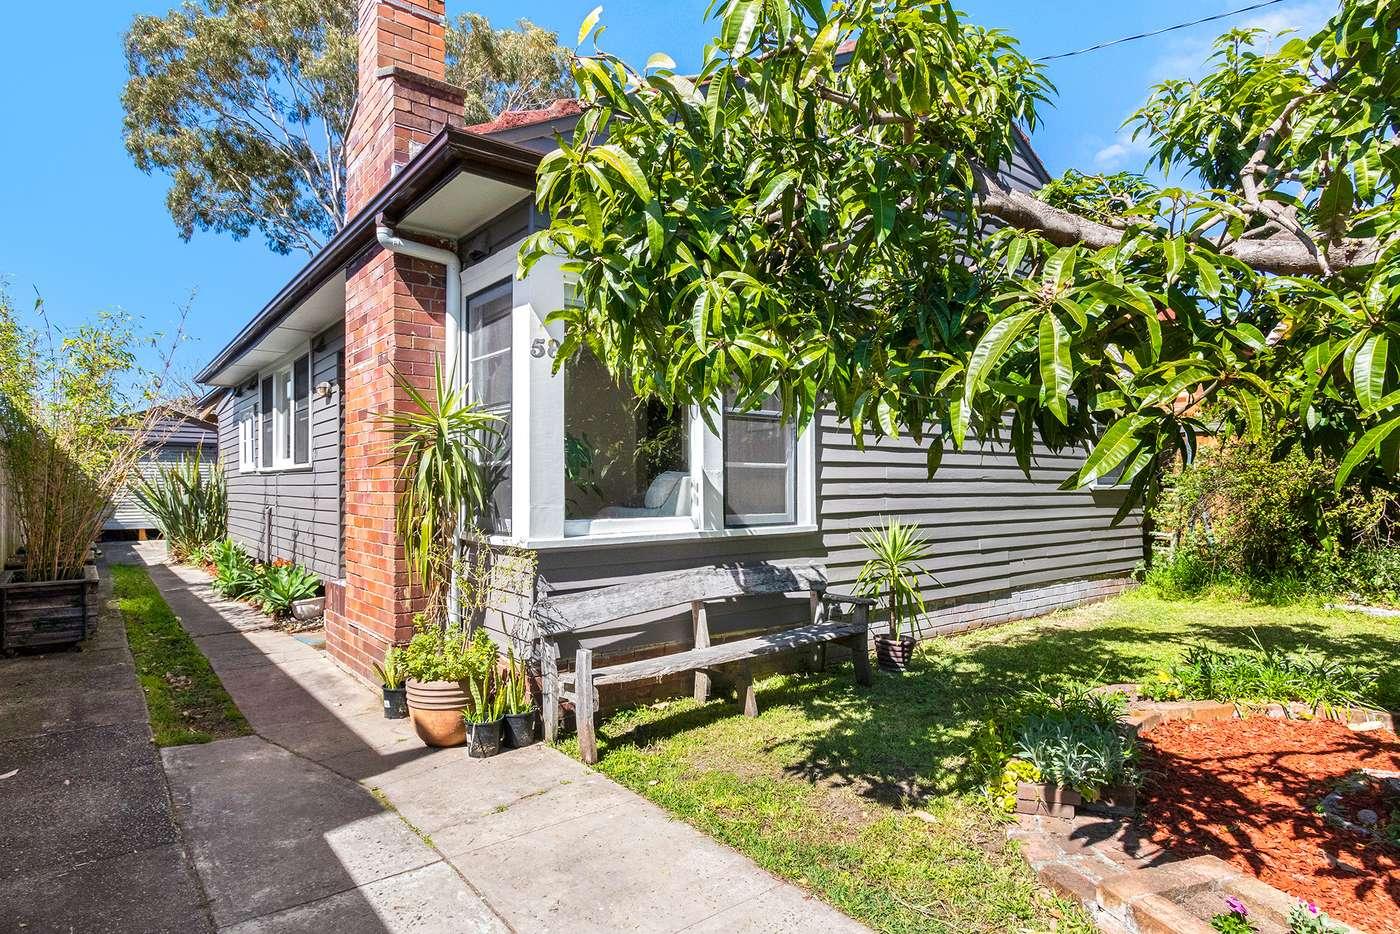 Main view of Homely house listing, 58 Birdwood Street, New Lambton NSW 2305